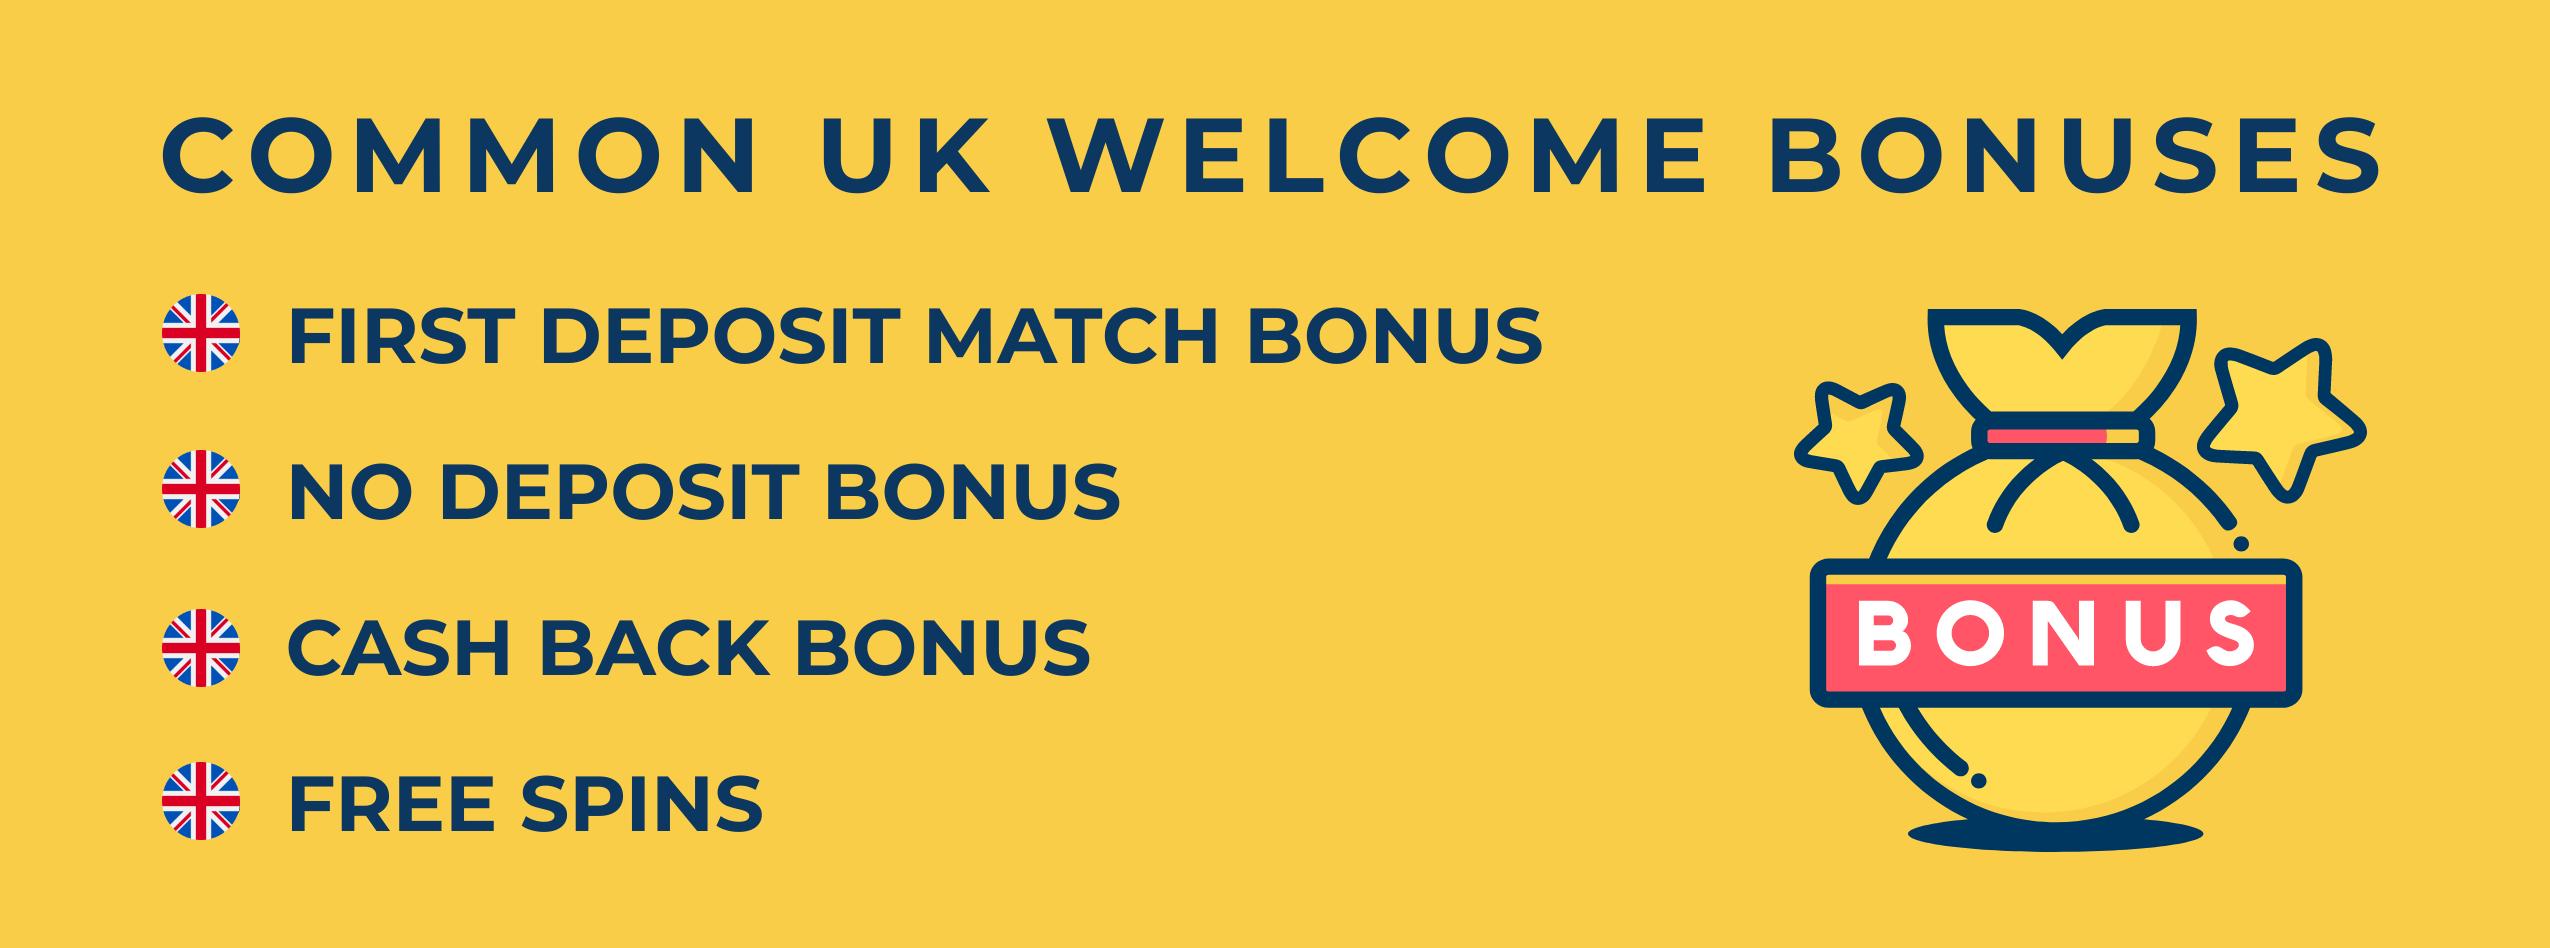 casino welcome bonuses uk